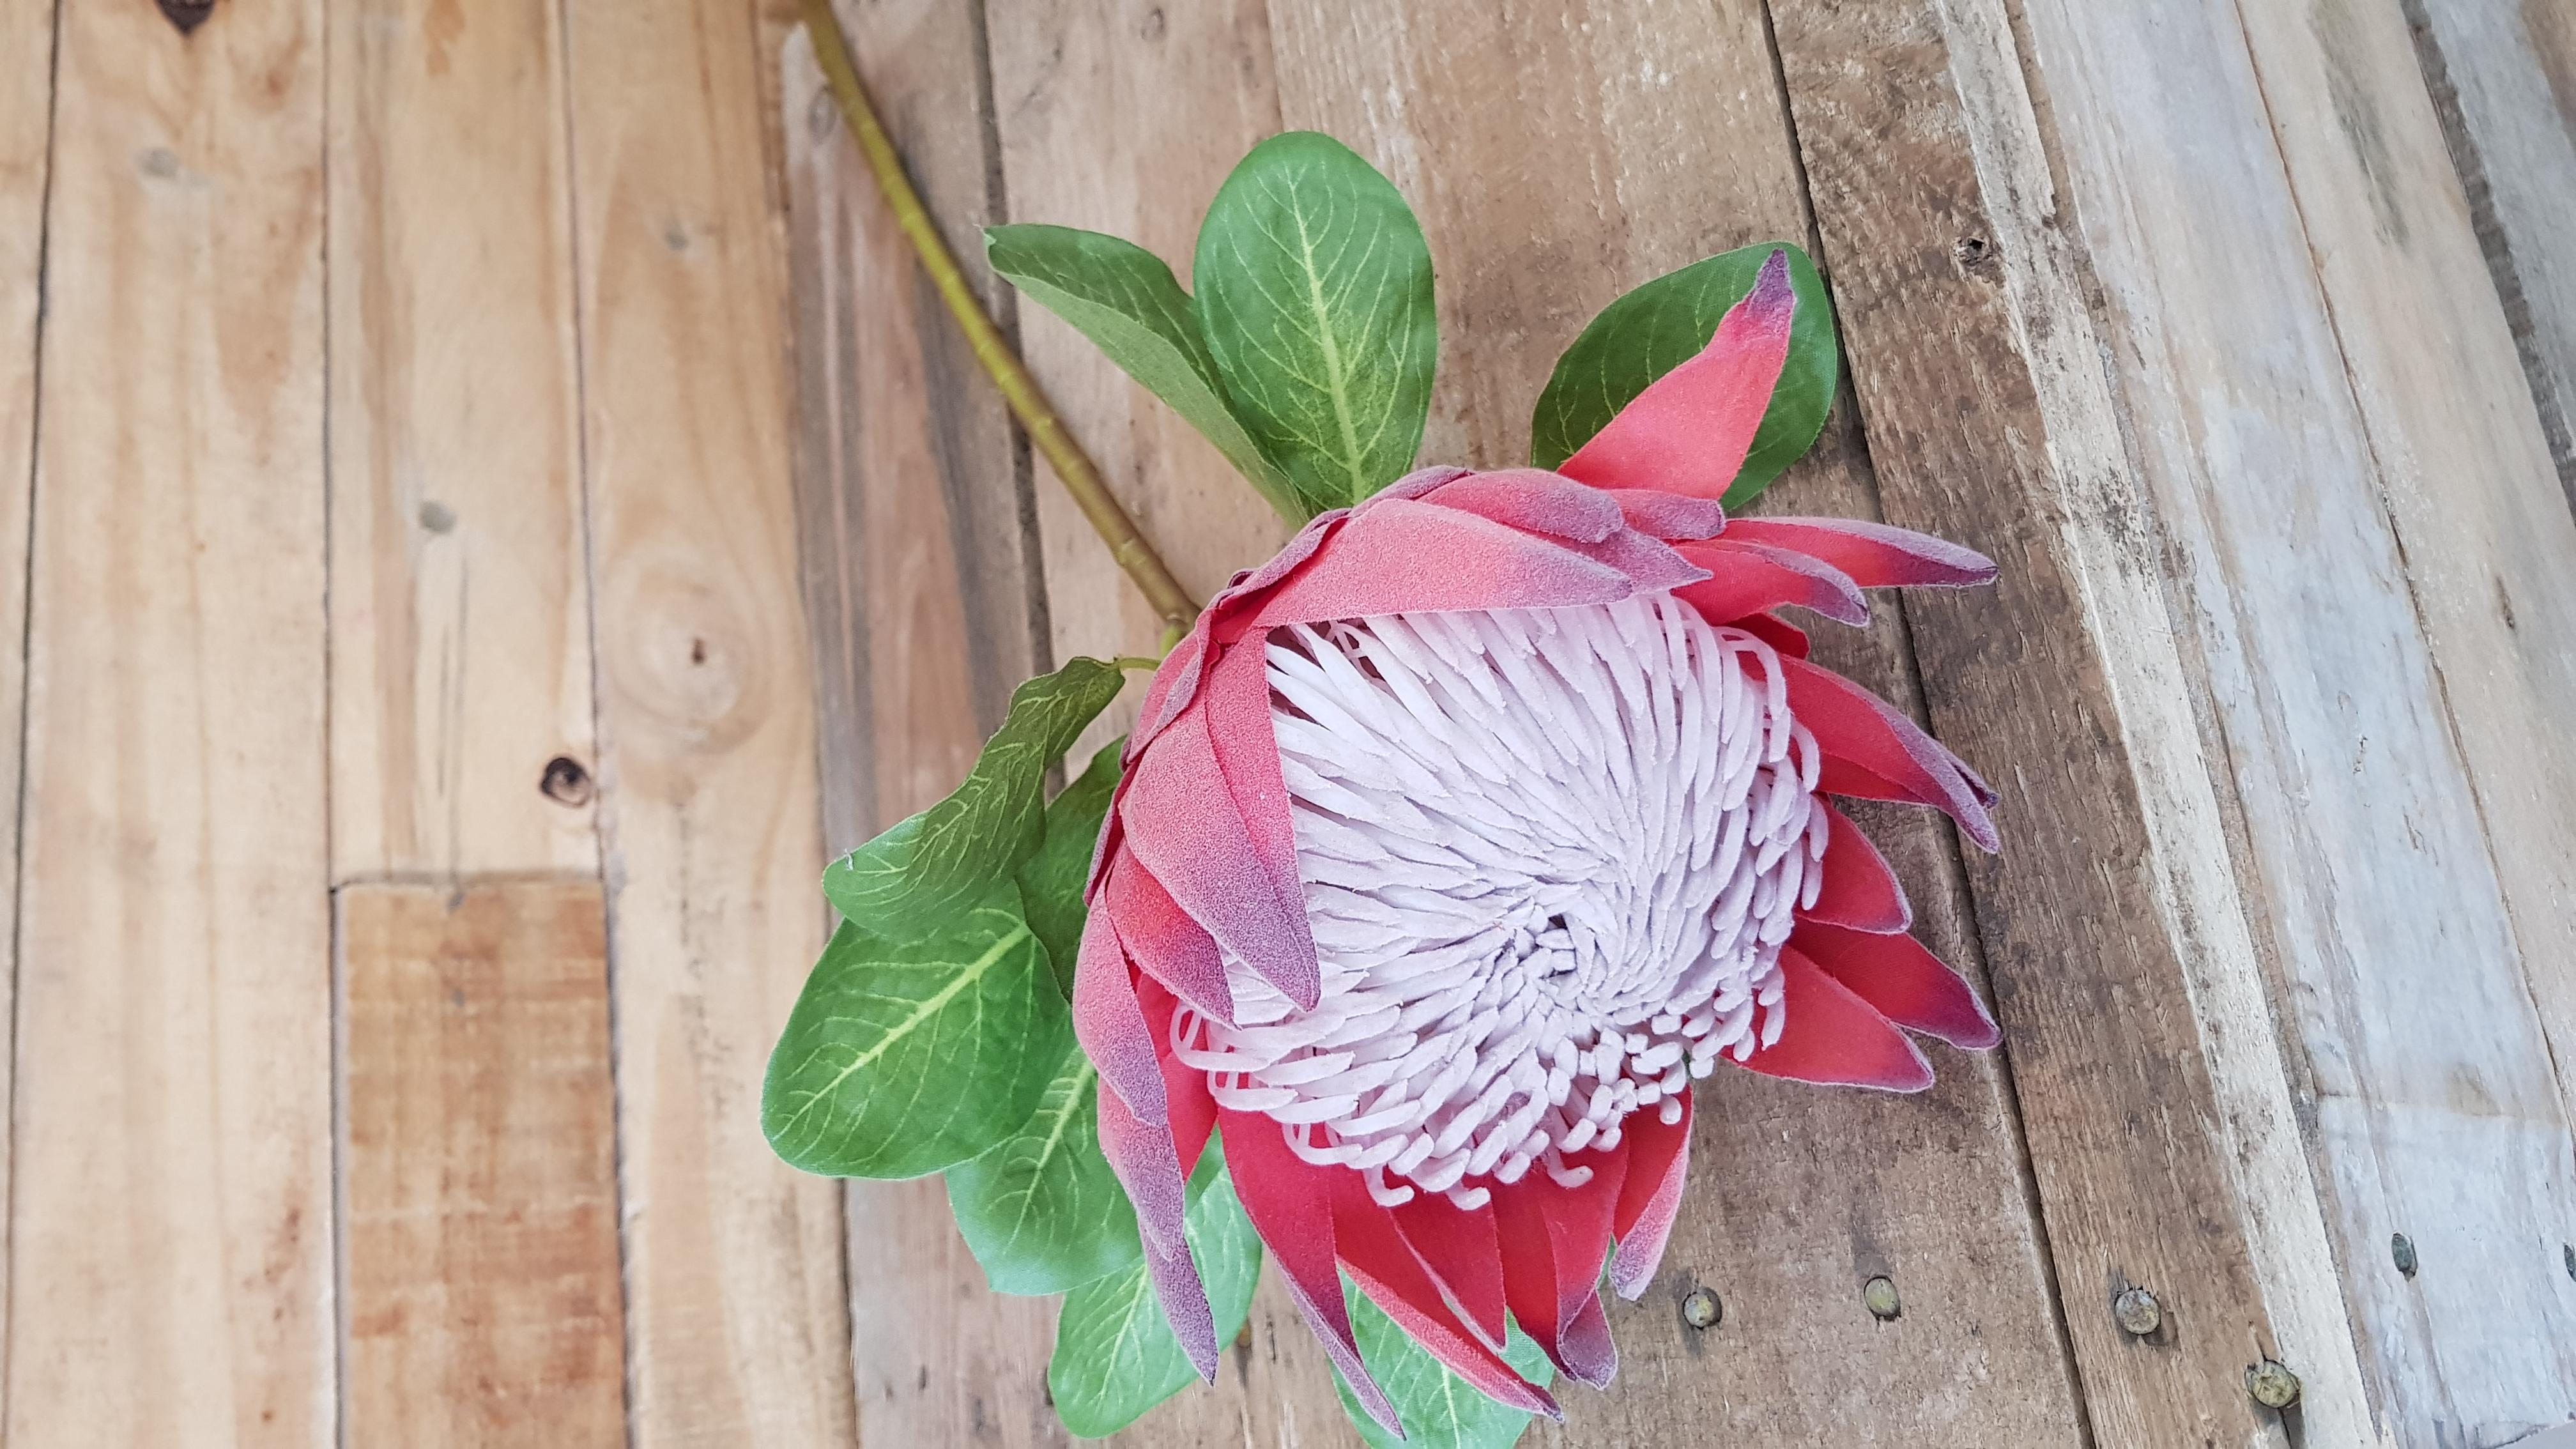 Wooden Proteas Gauteng Plaasmeisie Pty Ltd